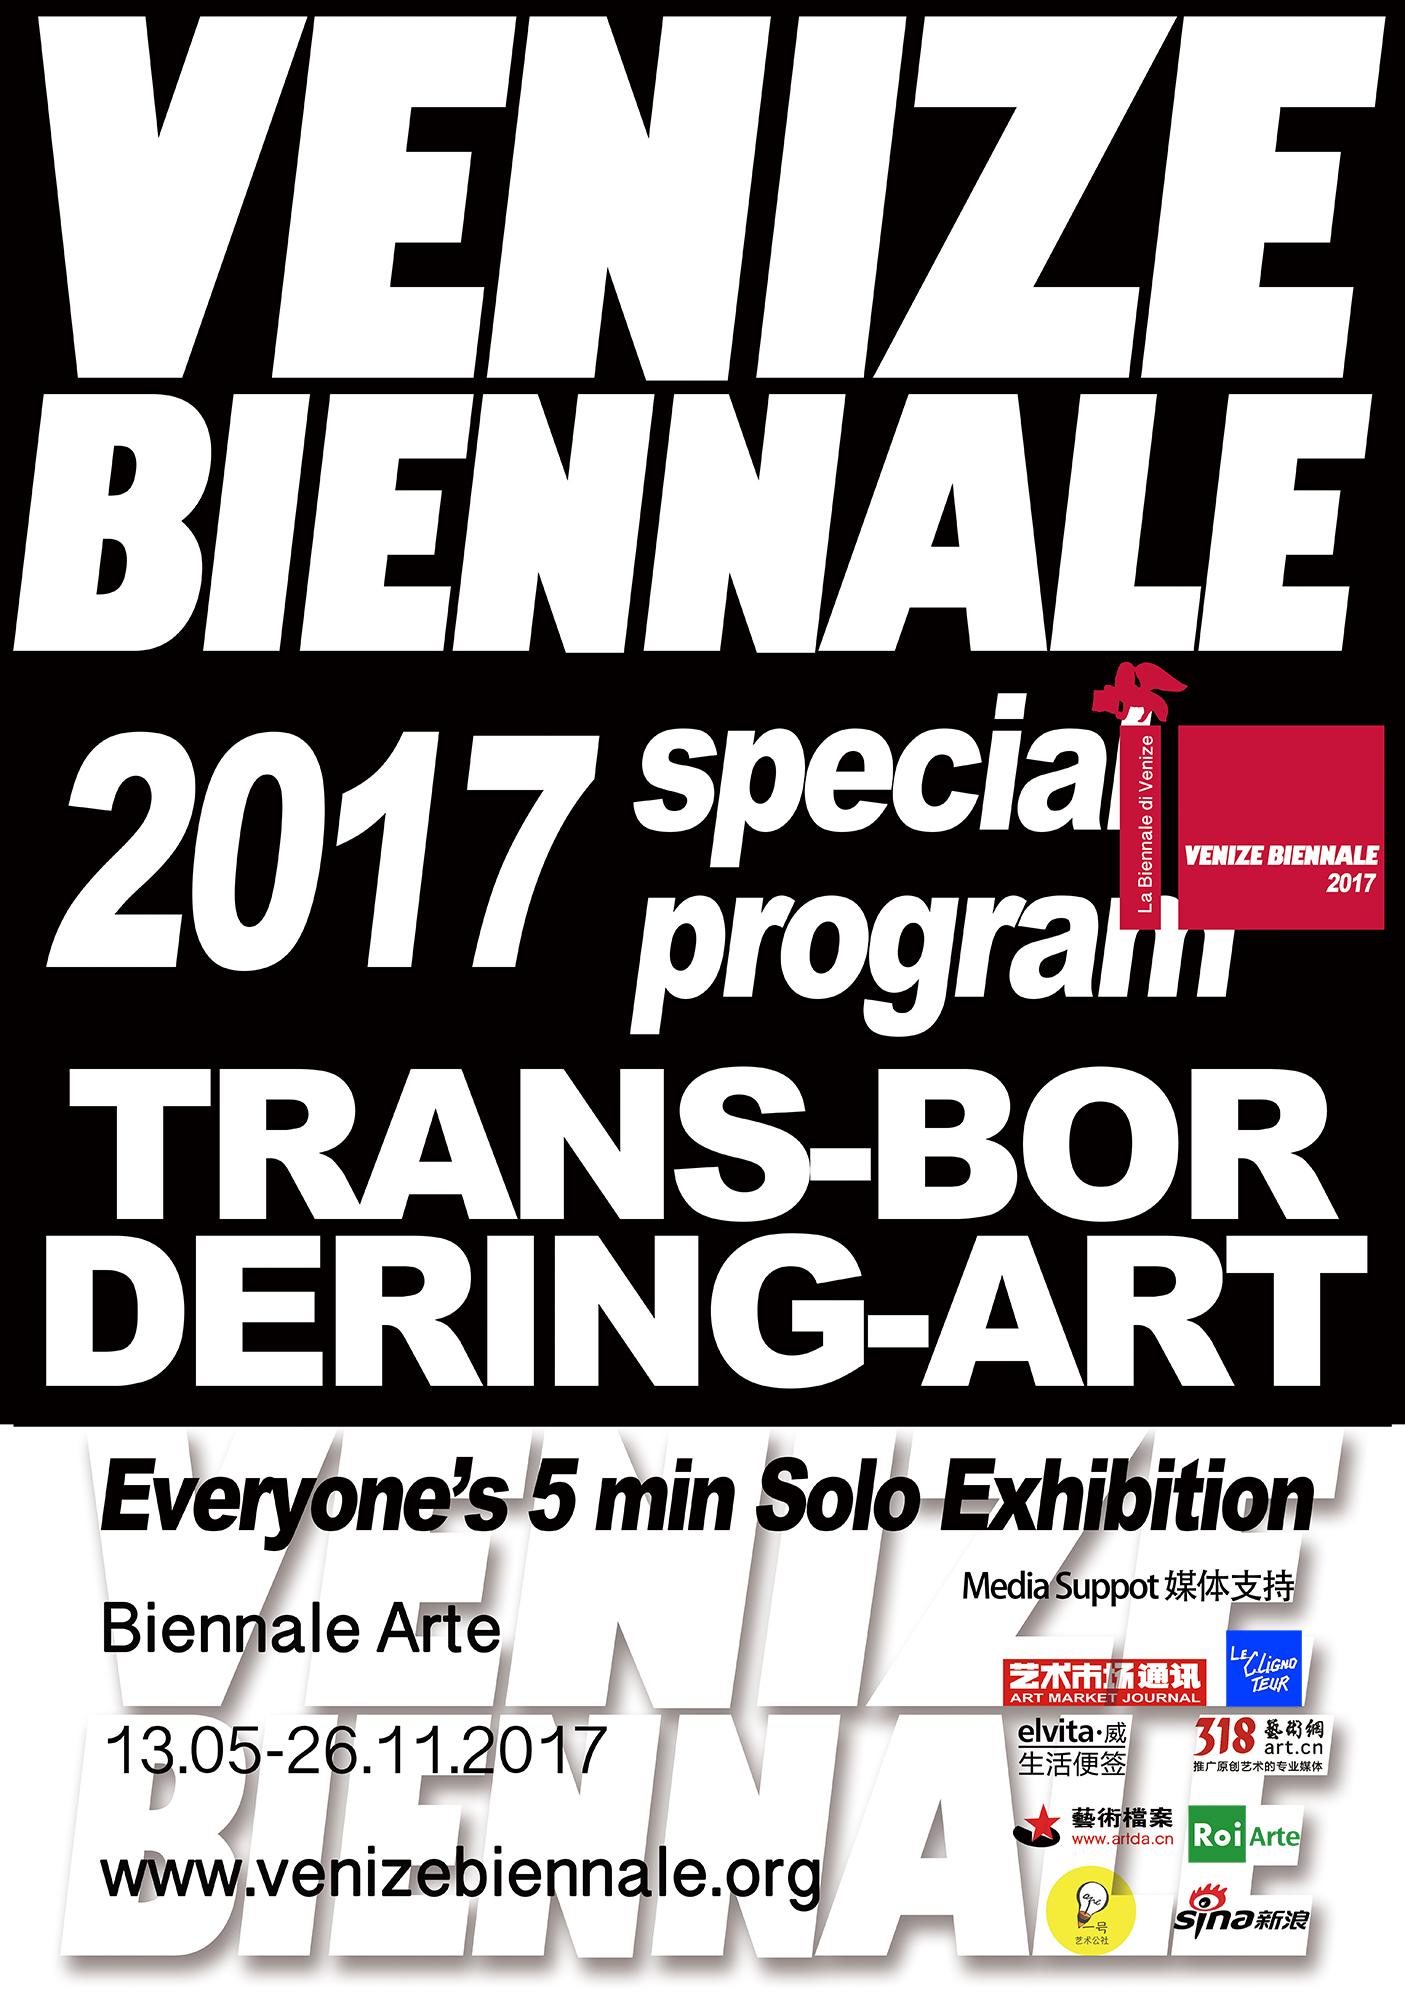 Venize双年展2017海报-2000.jpg